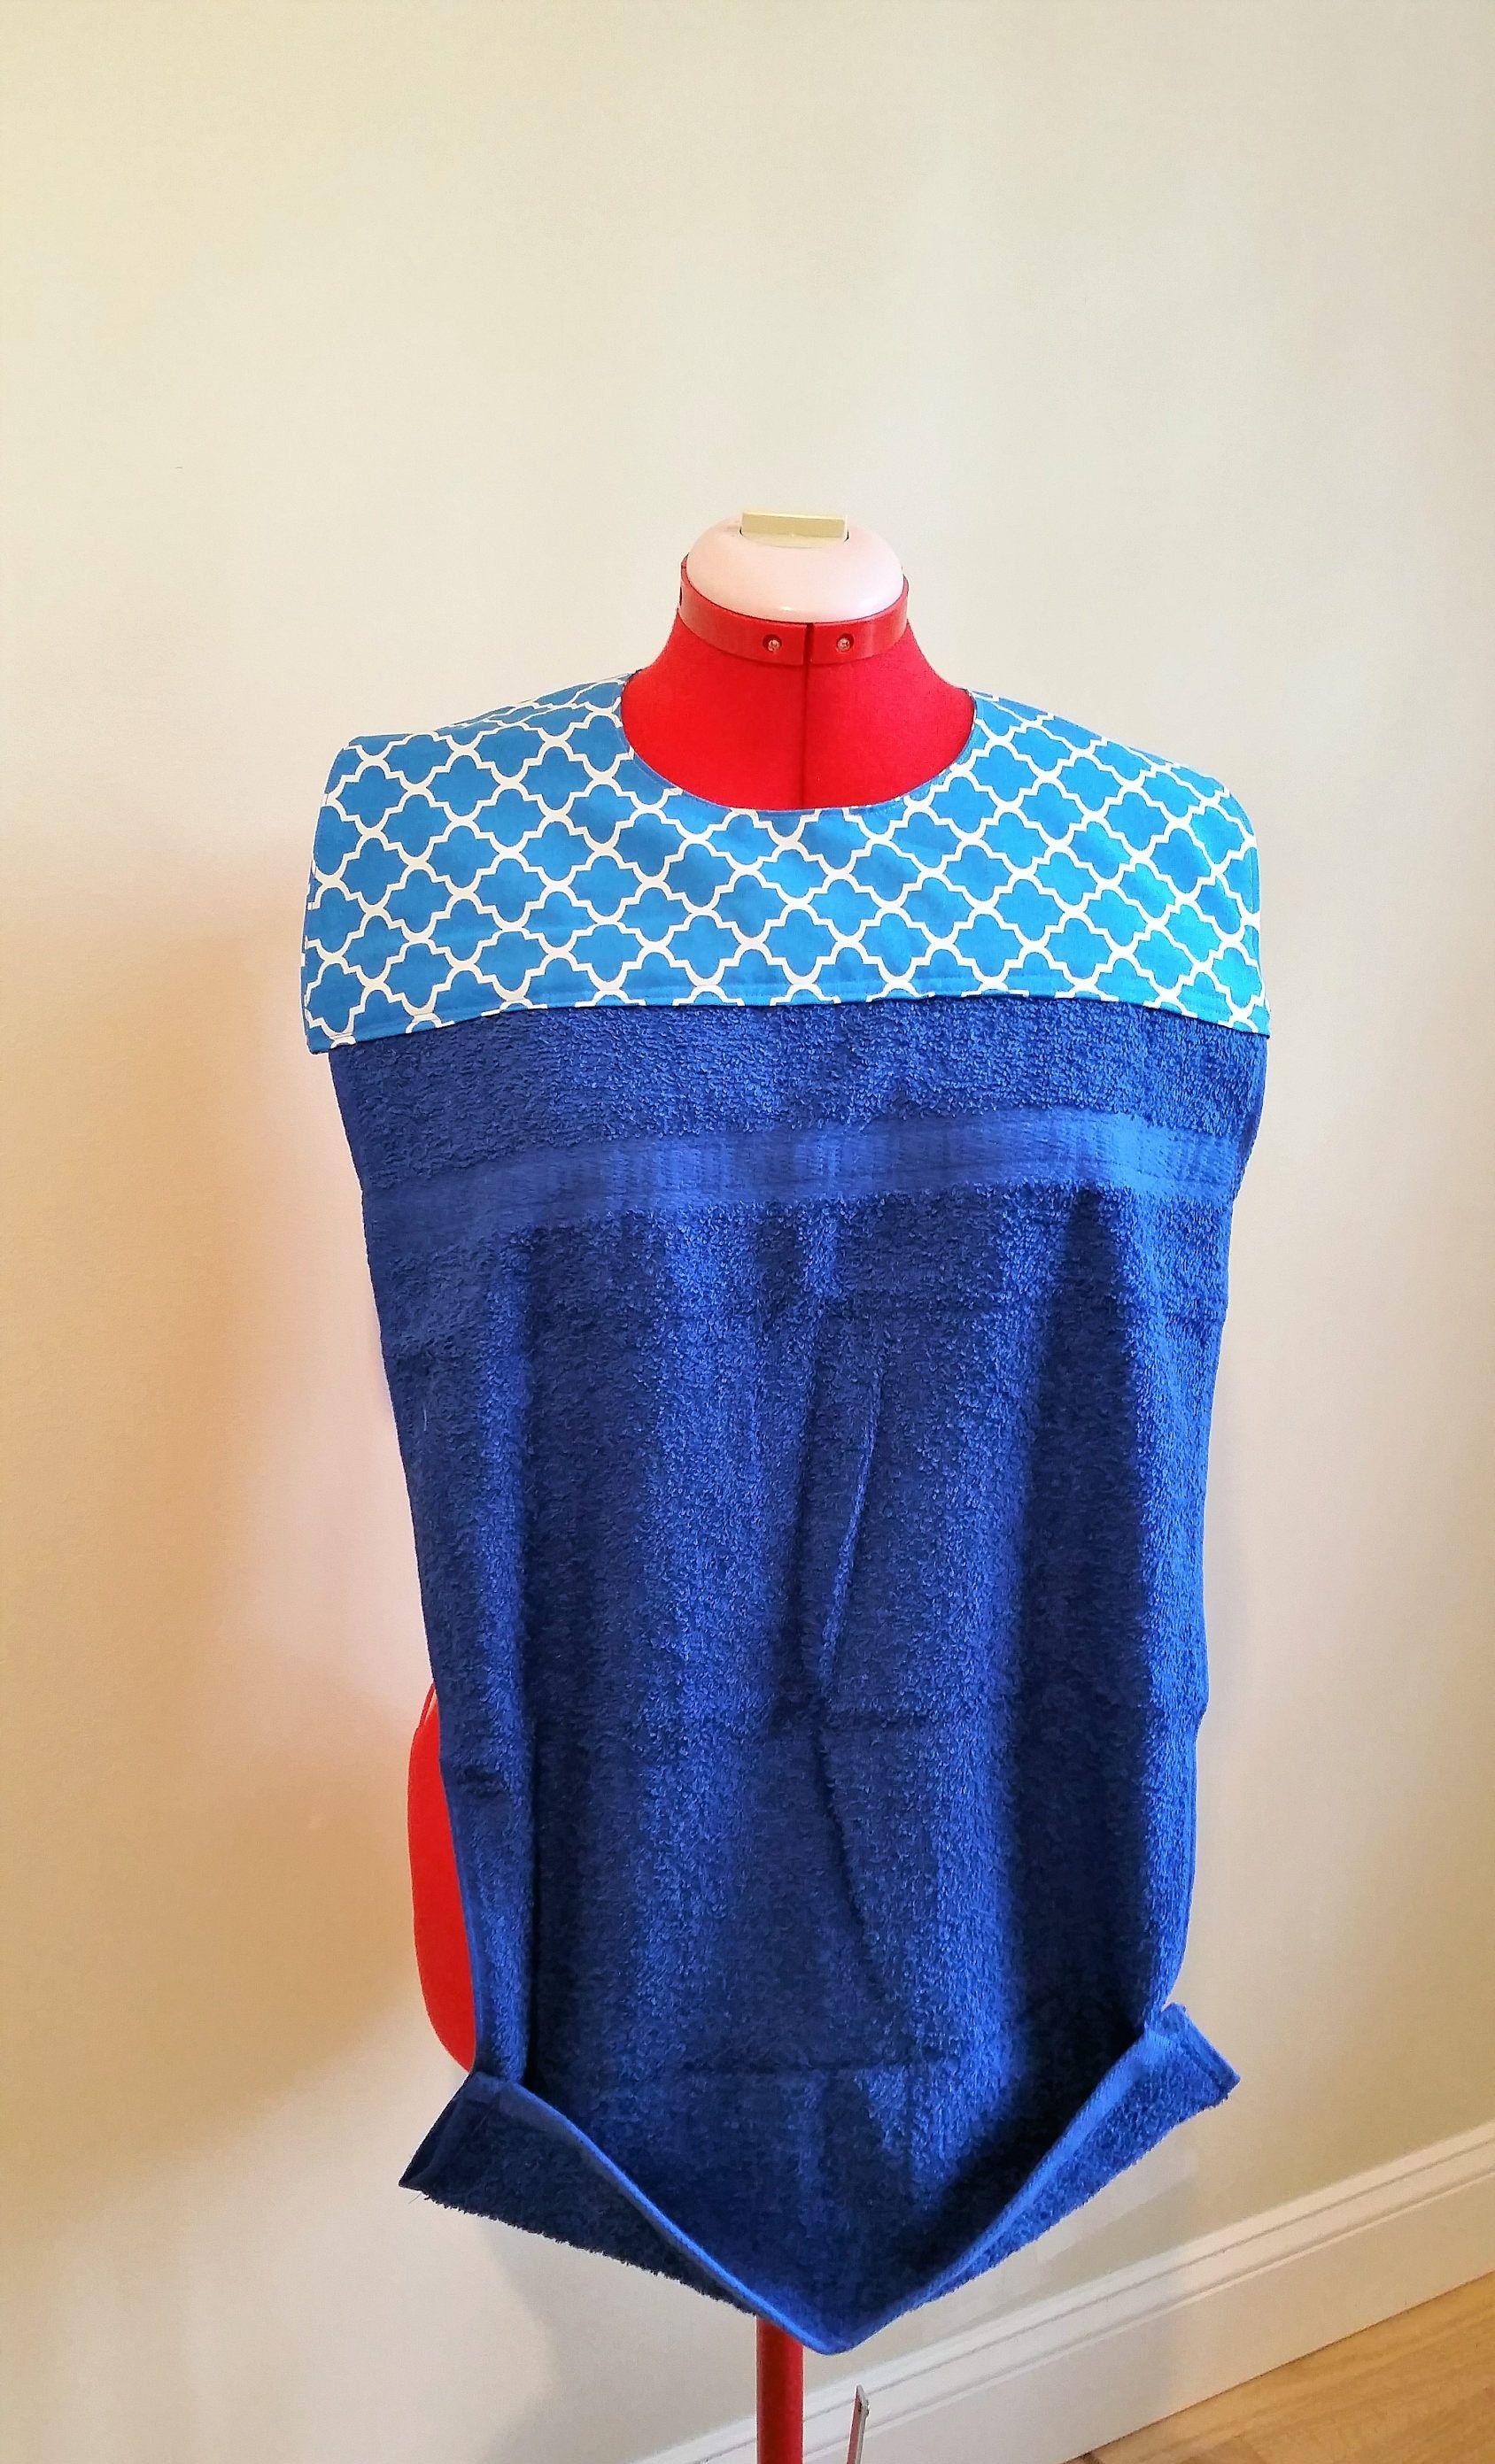 Bibs Adult Bib Hand Towel Bib Clothes Protector Pocket Bib Blue